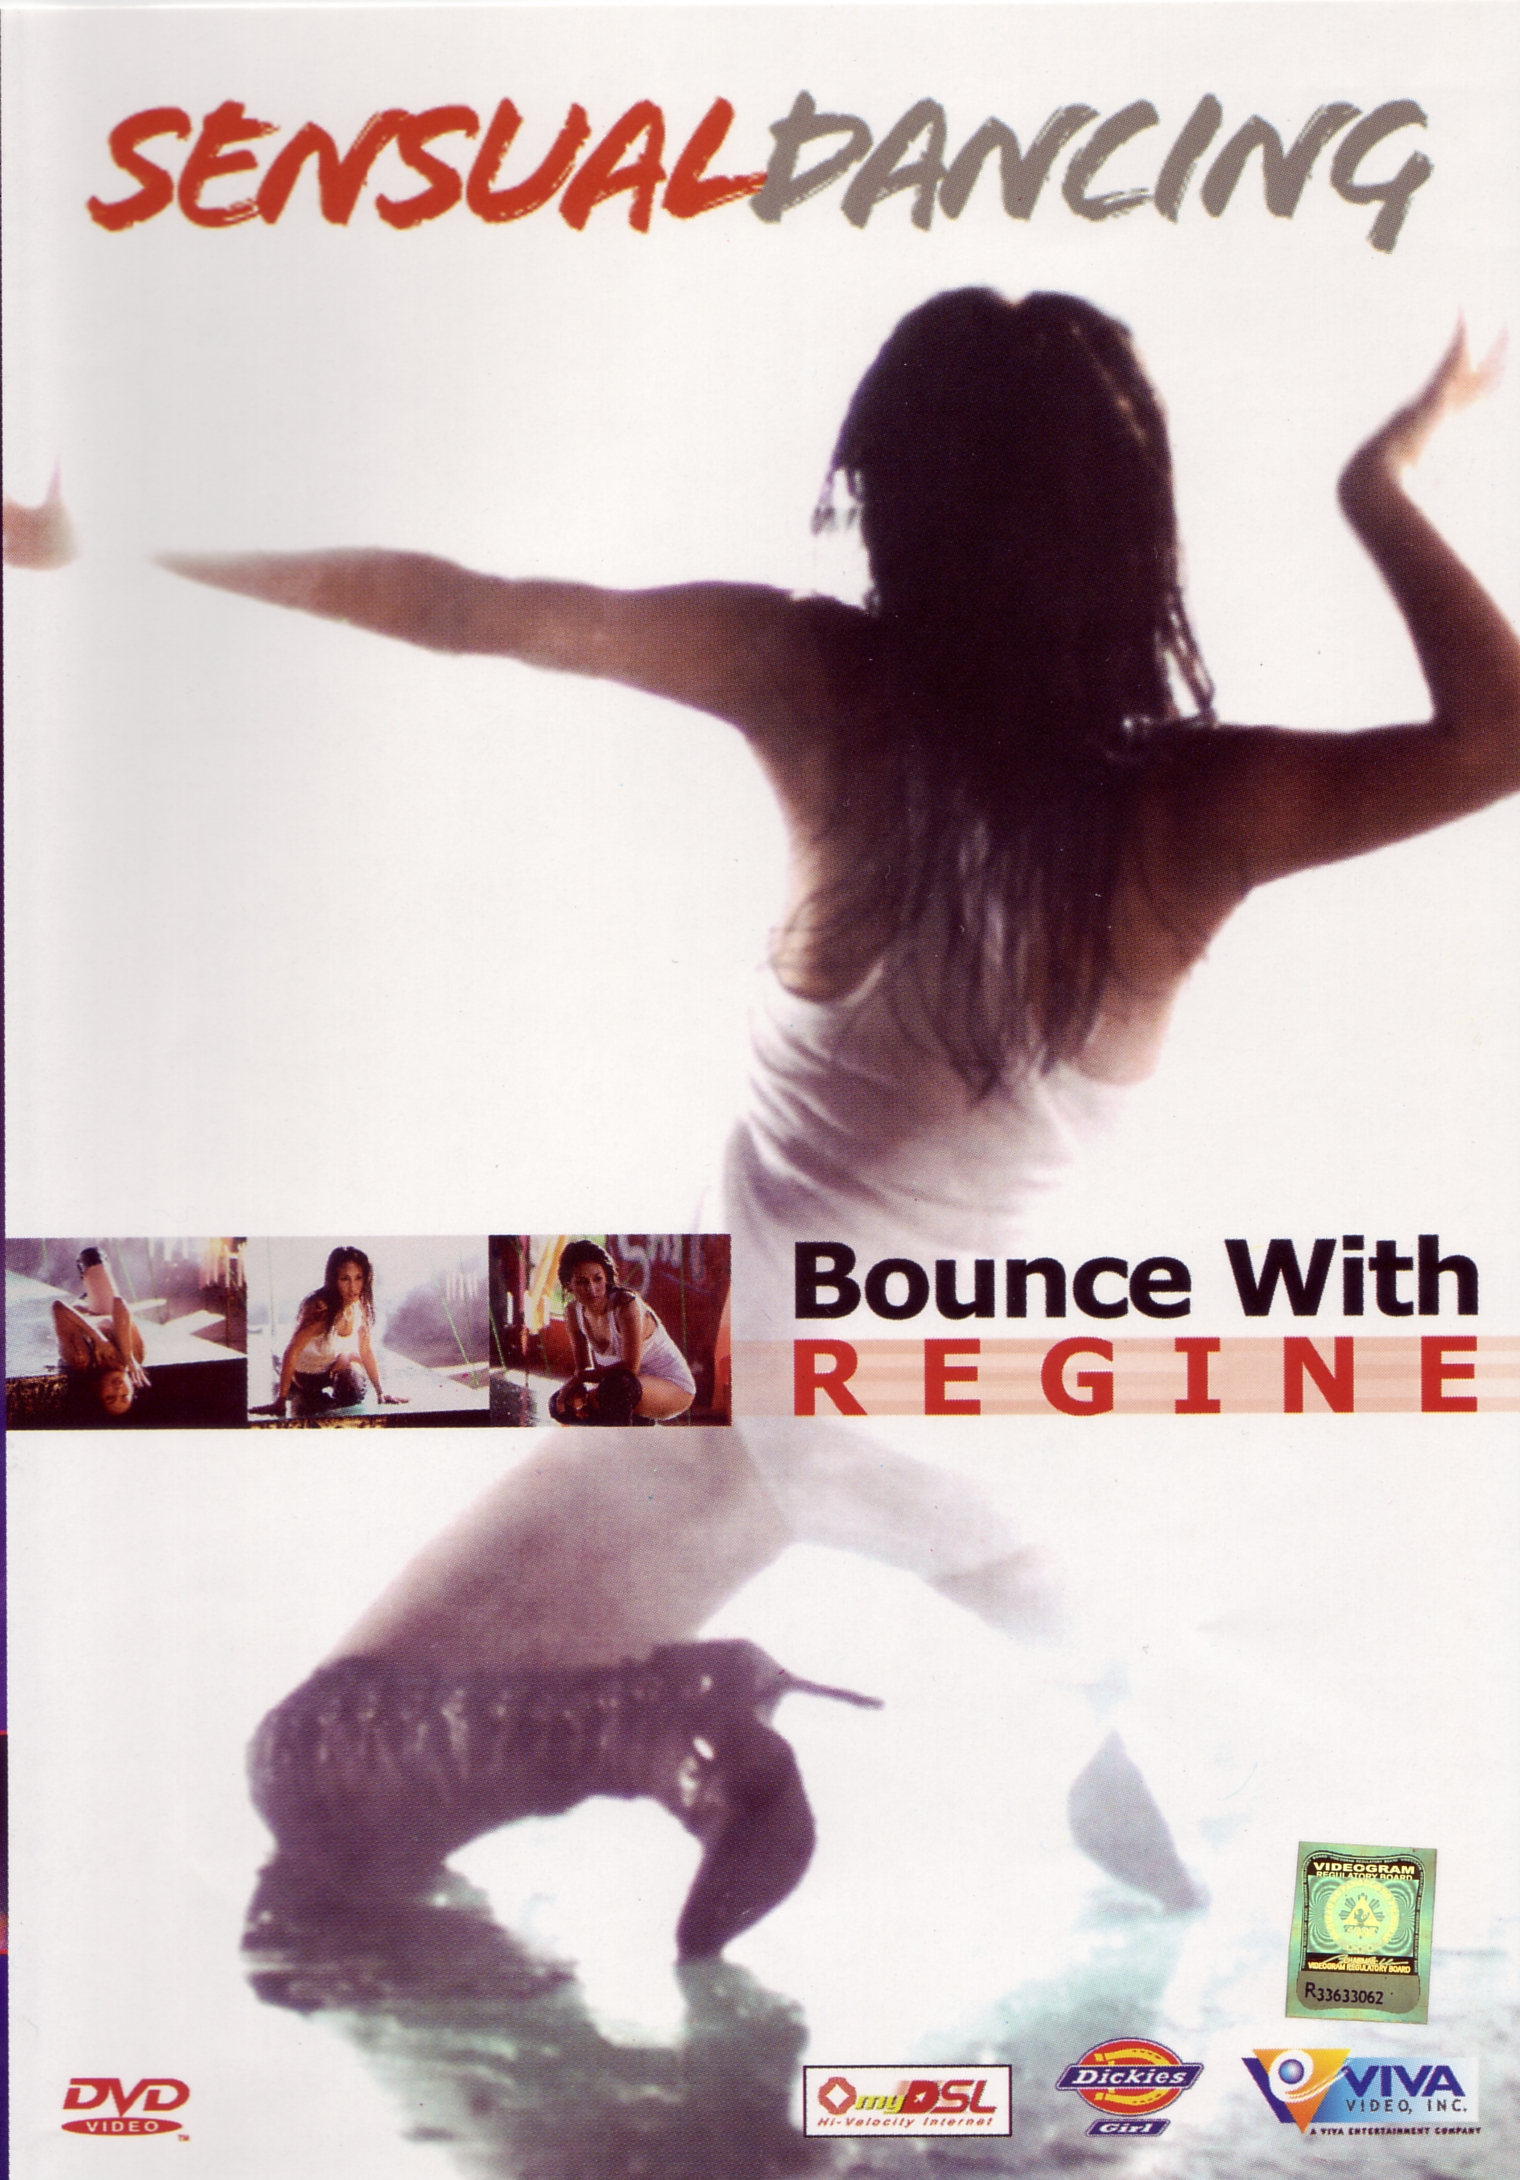 Sensual Dancing Bounce With Regine